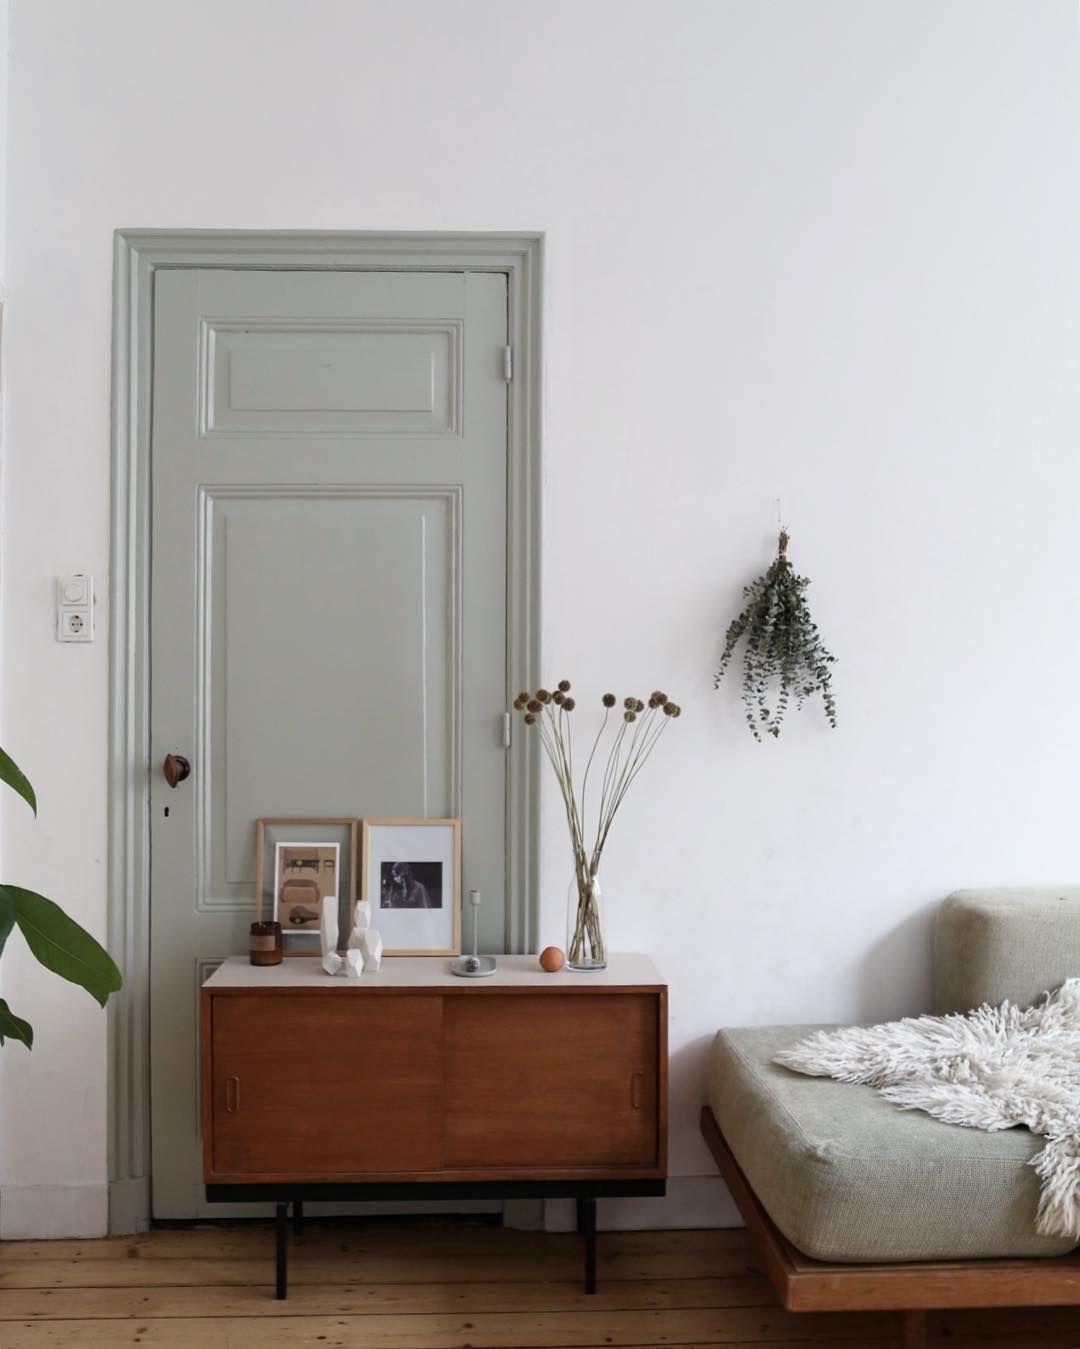 White Painted Interior Small: Maison Ardeche, Encadrement